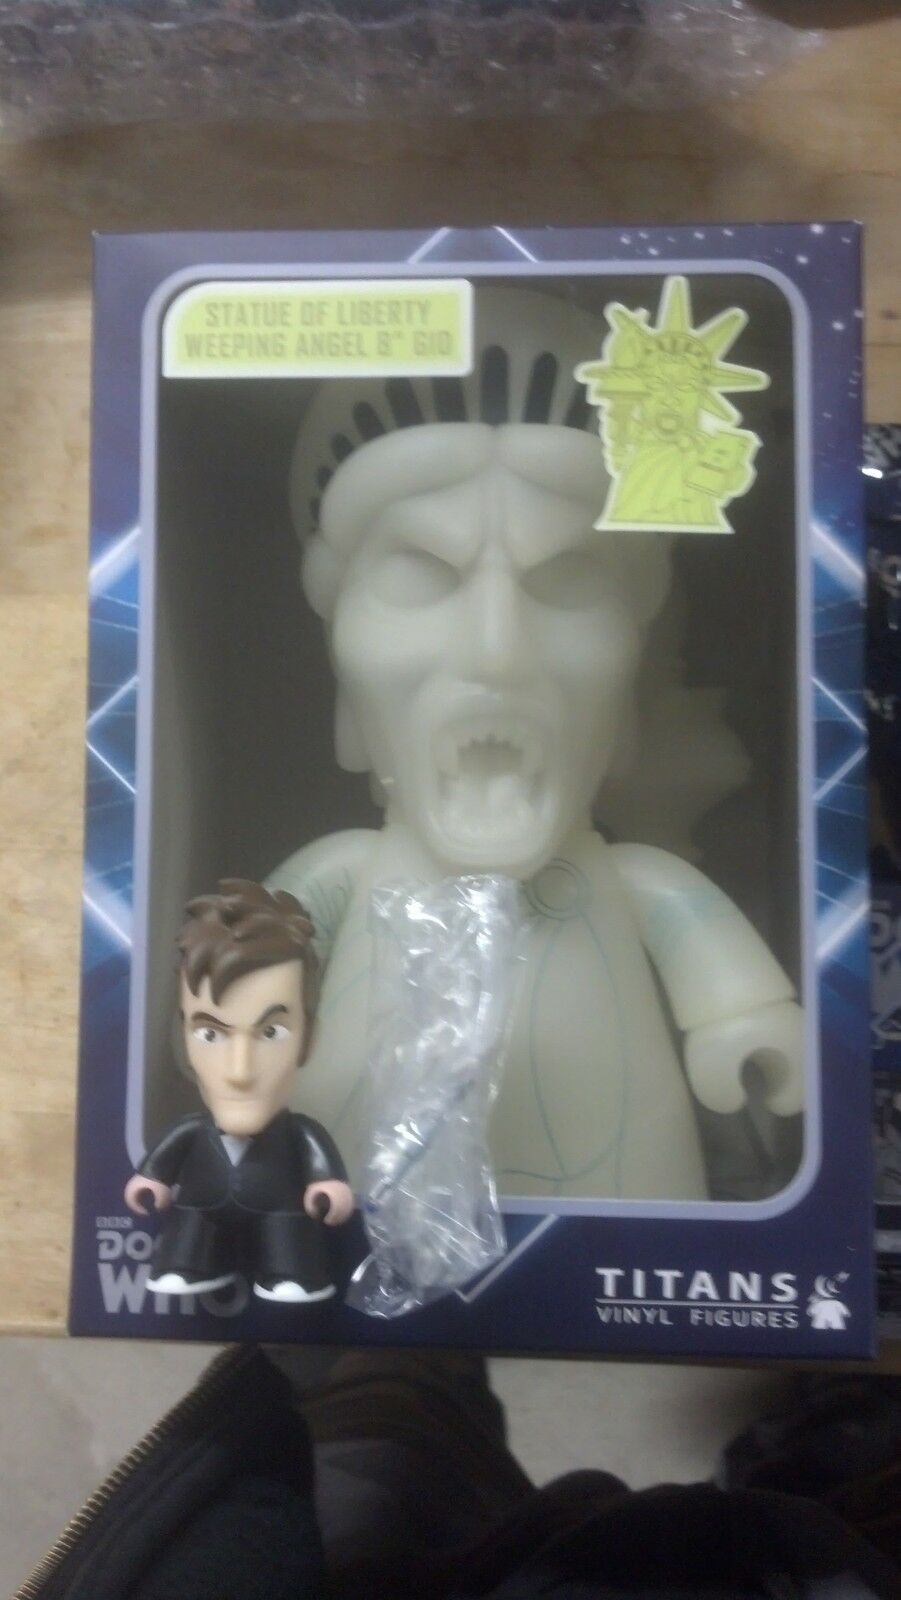 NYCC 2013 Doctor Who Tuxedo Mini Exclusive + Statue of Liberty Weeping Angel GID